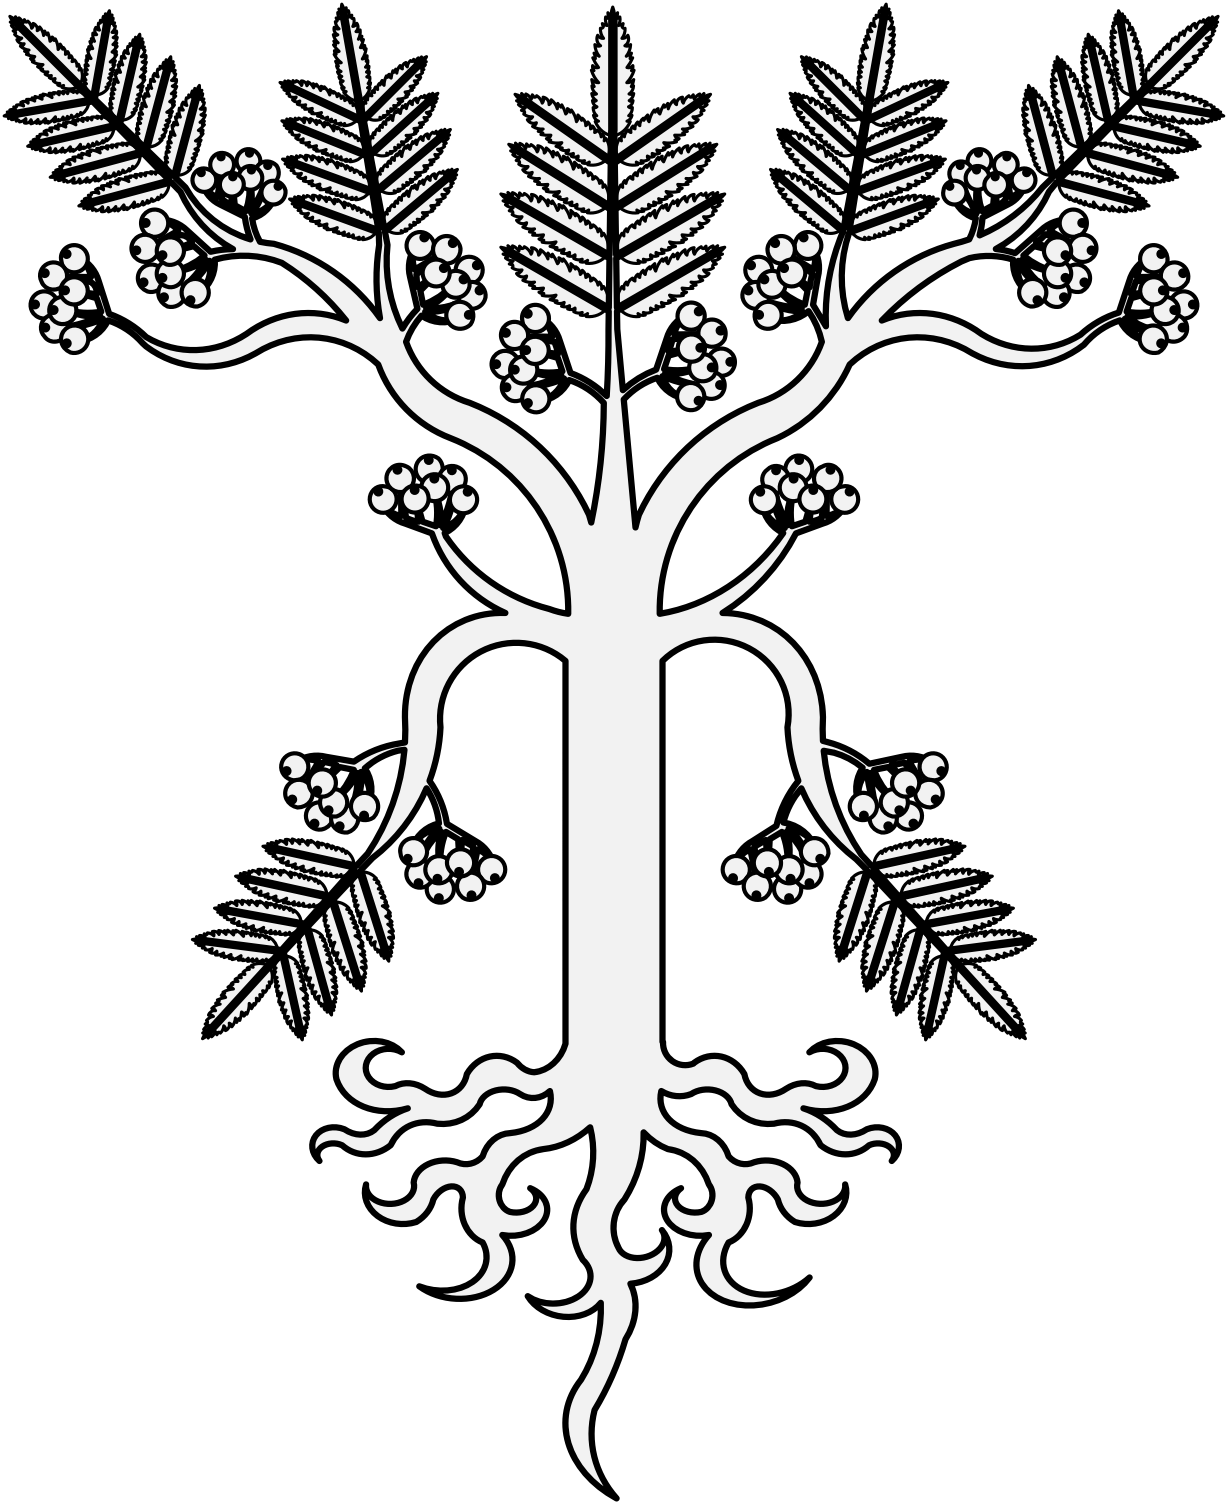 Rowan Tree Drawing at GetDrawings.com | Free for personal use Rowan ... graphic freeuse stock